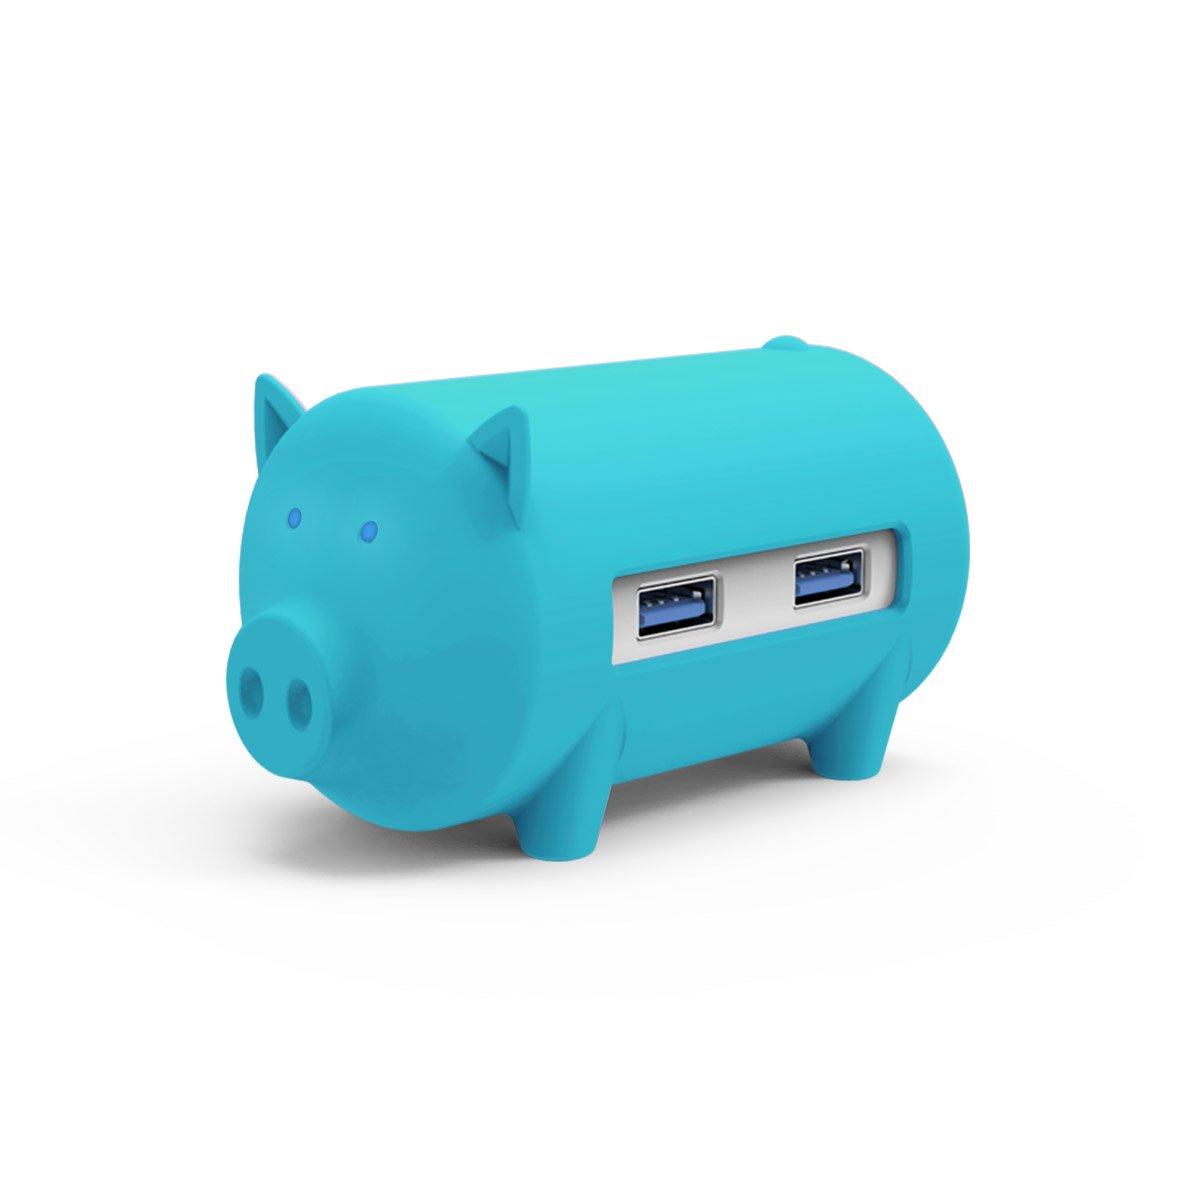 ORICO HUb USB 3.0 con 3 interfaccia USB3.0